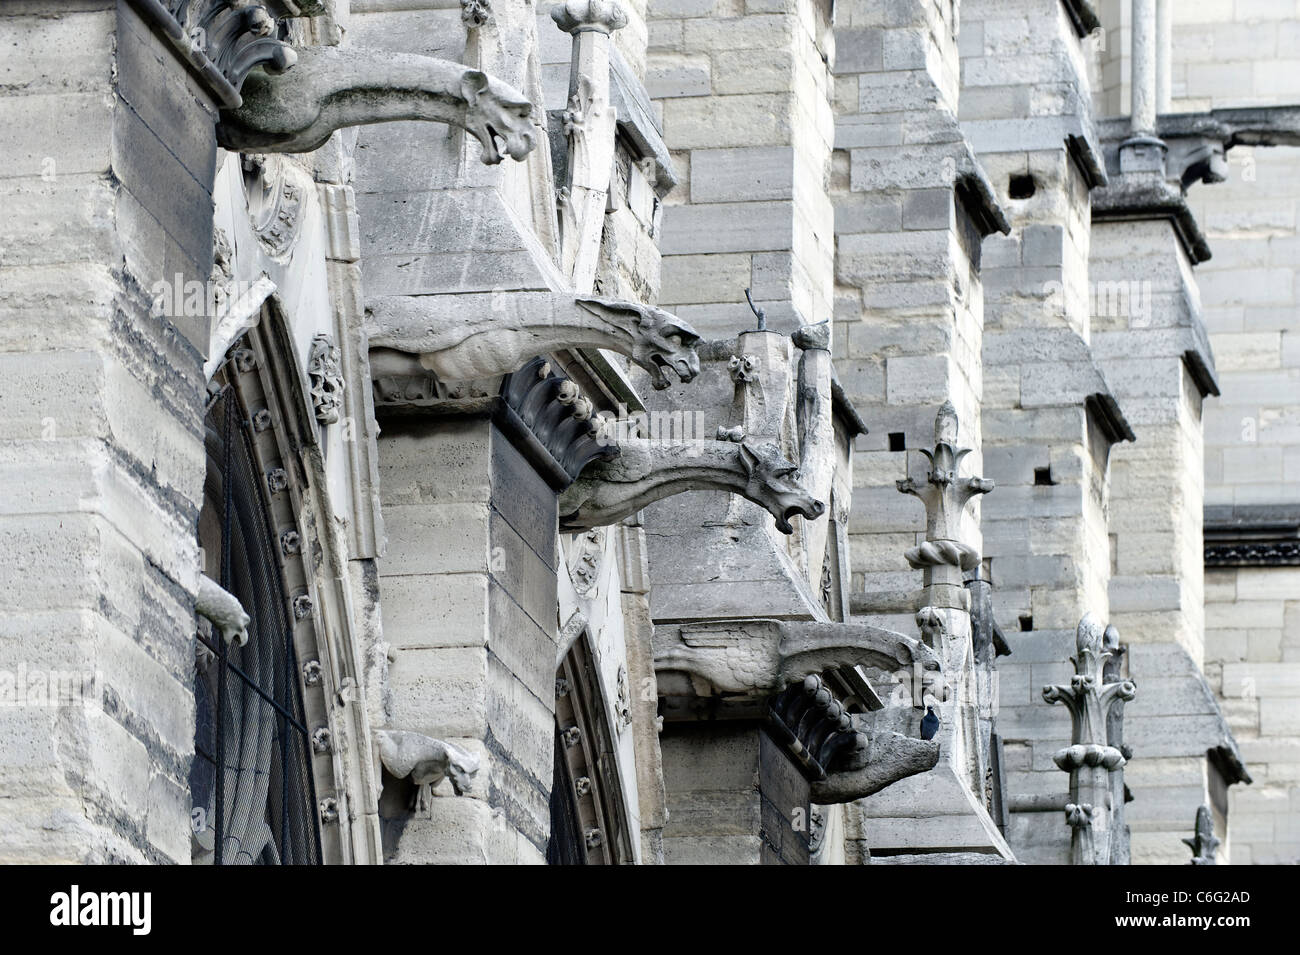 Gargoyles of Notre Dame Cathedral, Paris, France - Stock Image